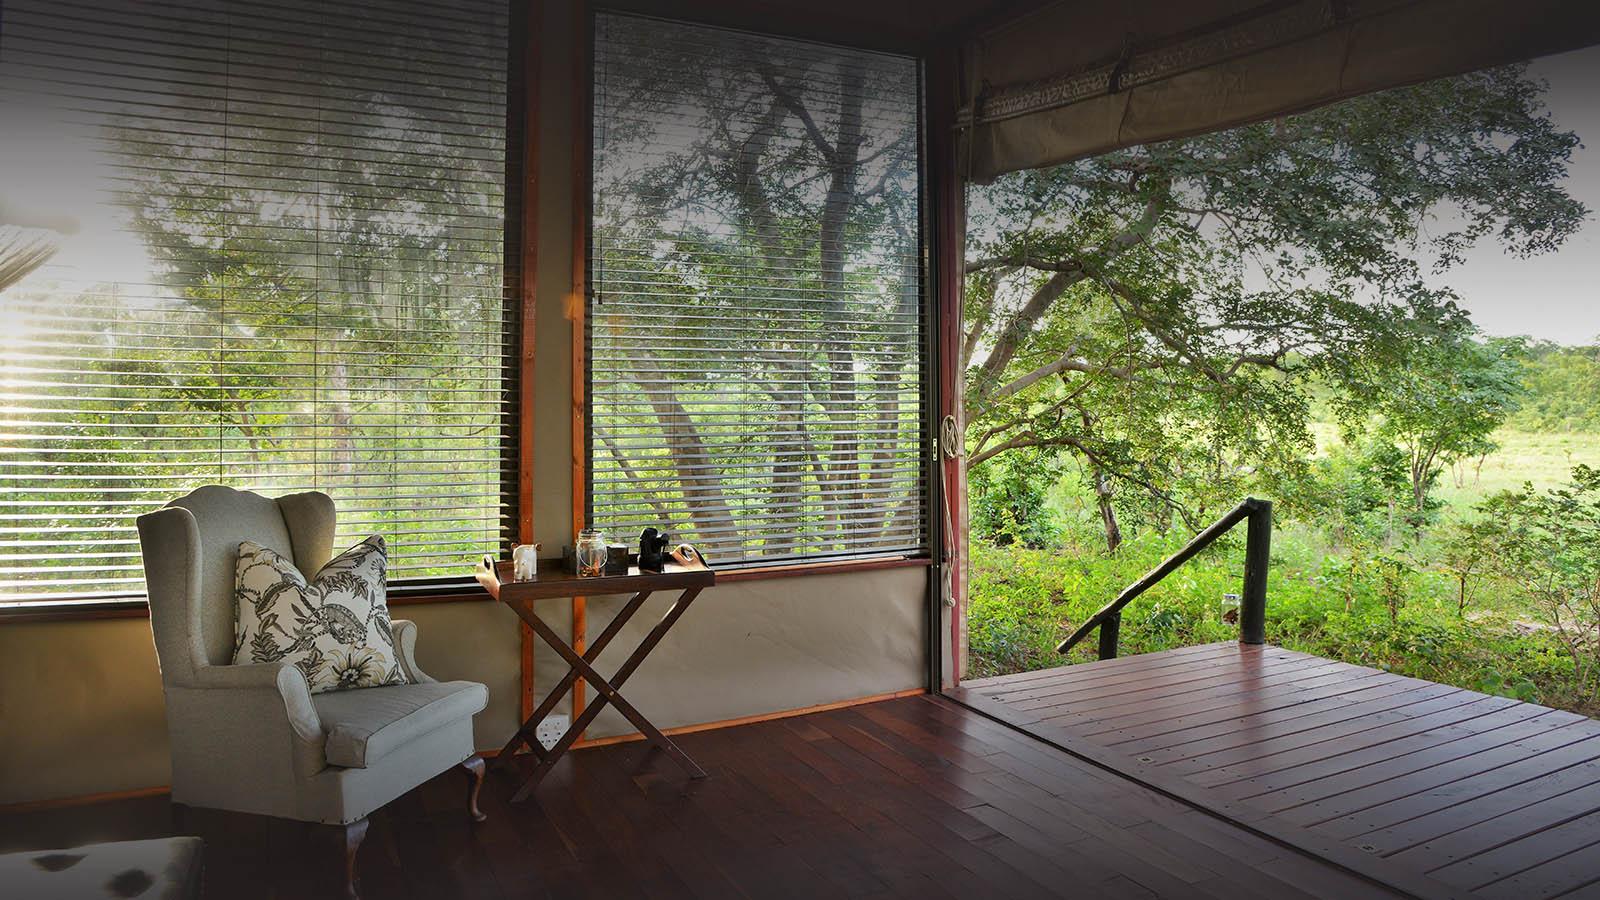 khulus retreat hwange-national-park-zimbabwe-lodges-villa-view